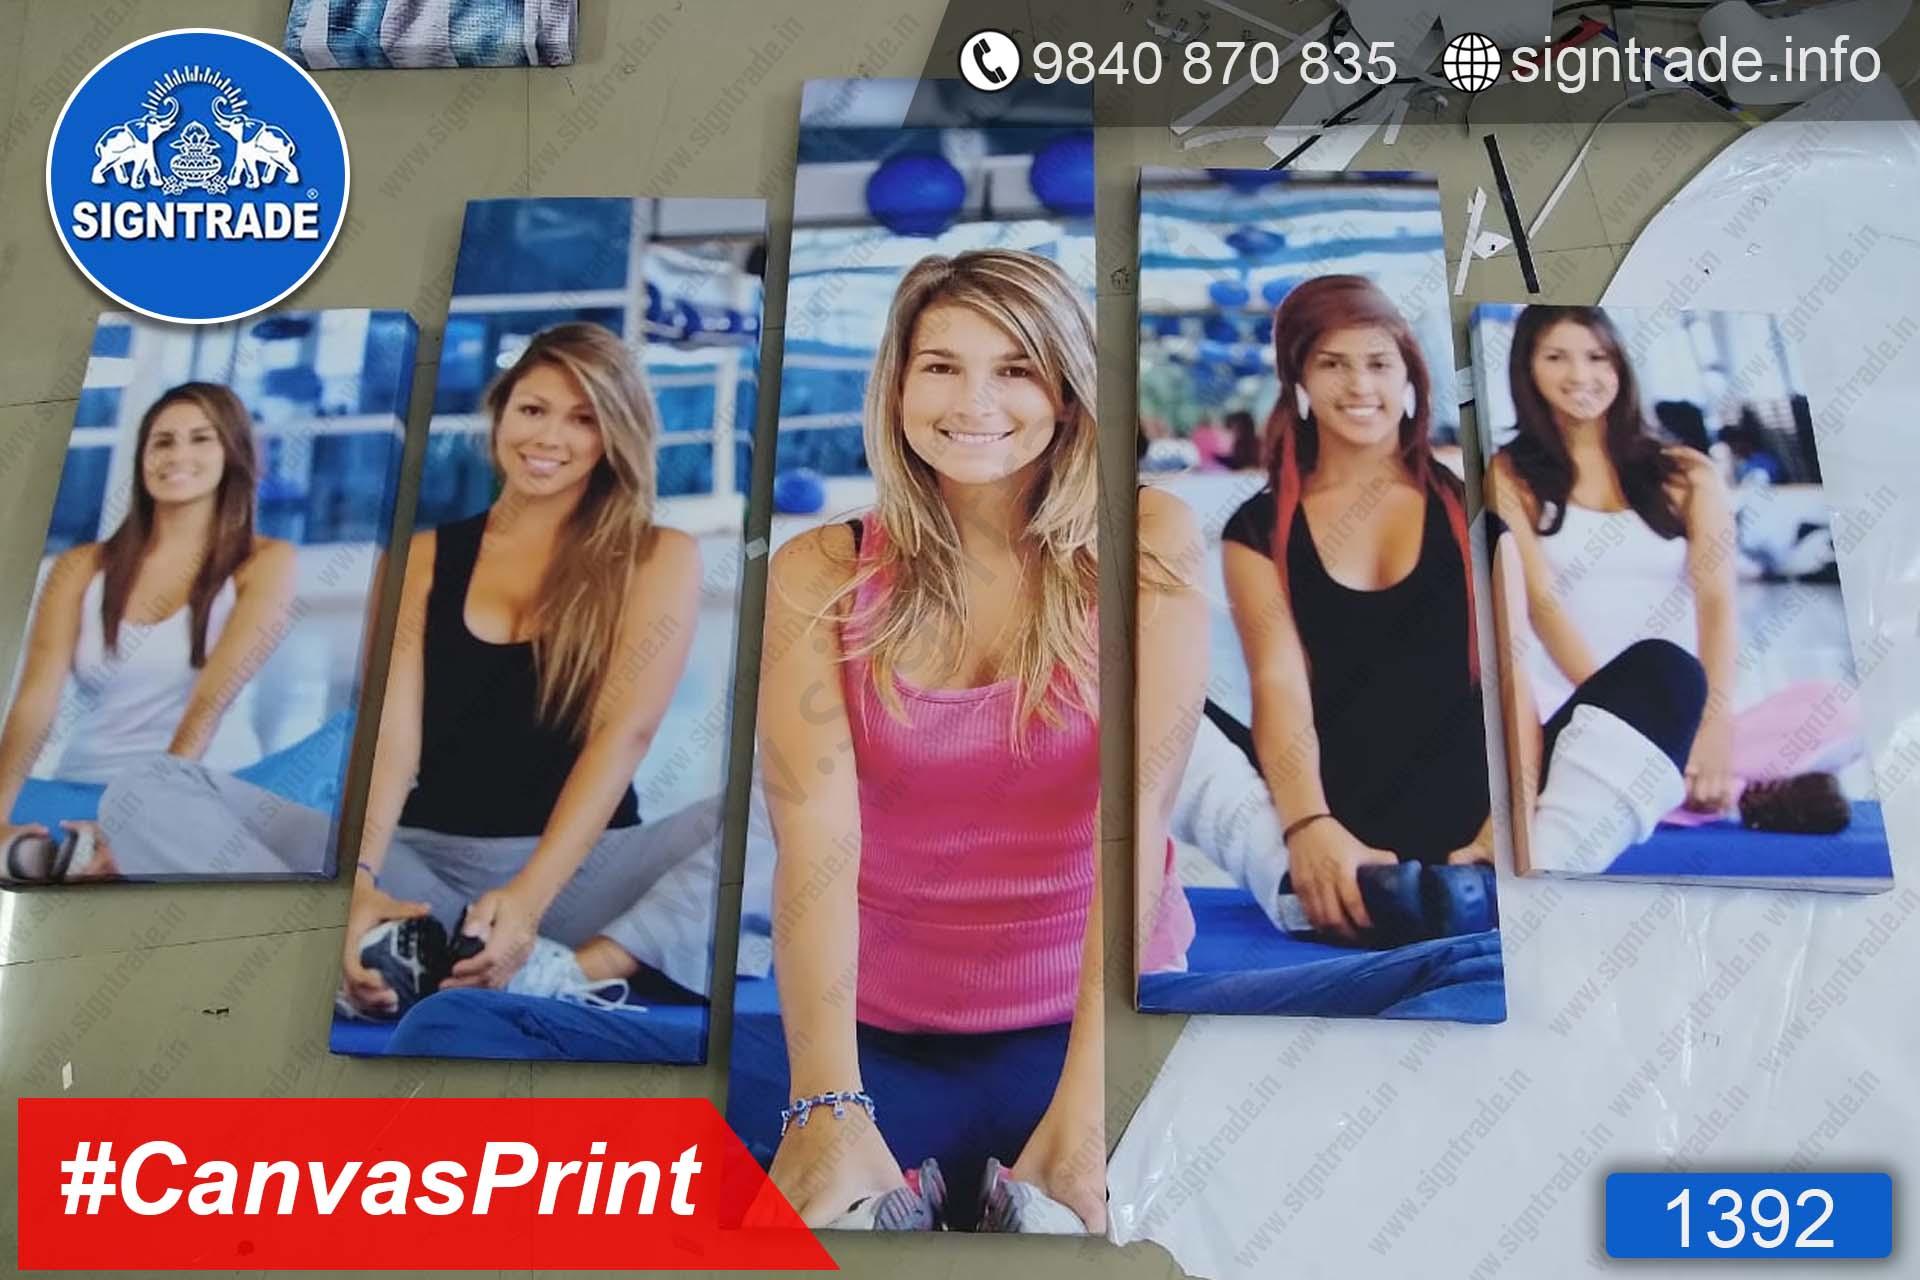 1392, Yoga Womens Canvas Print, Canvas Prints, personalised Canvas Prints, canvas art print, Custom canvas print